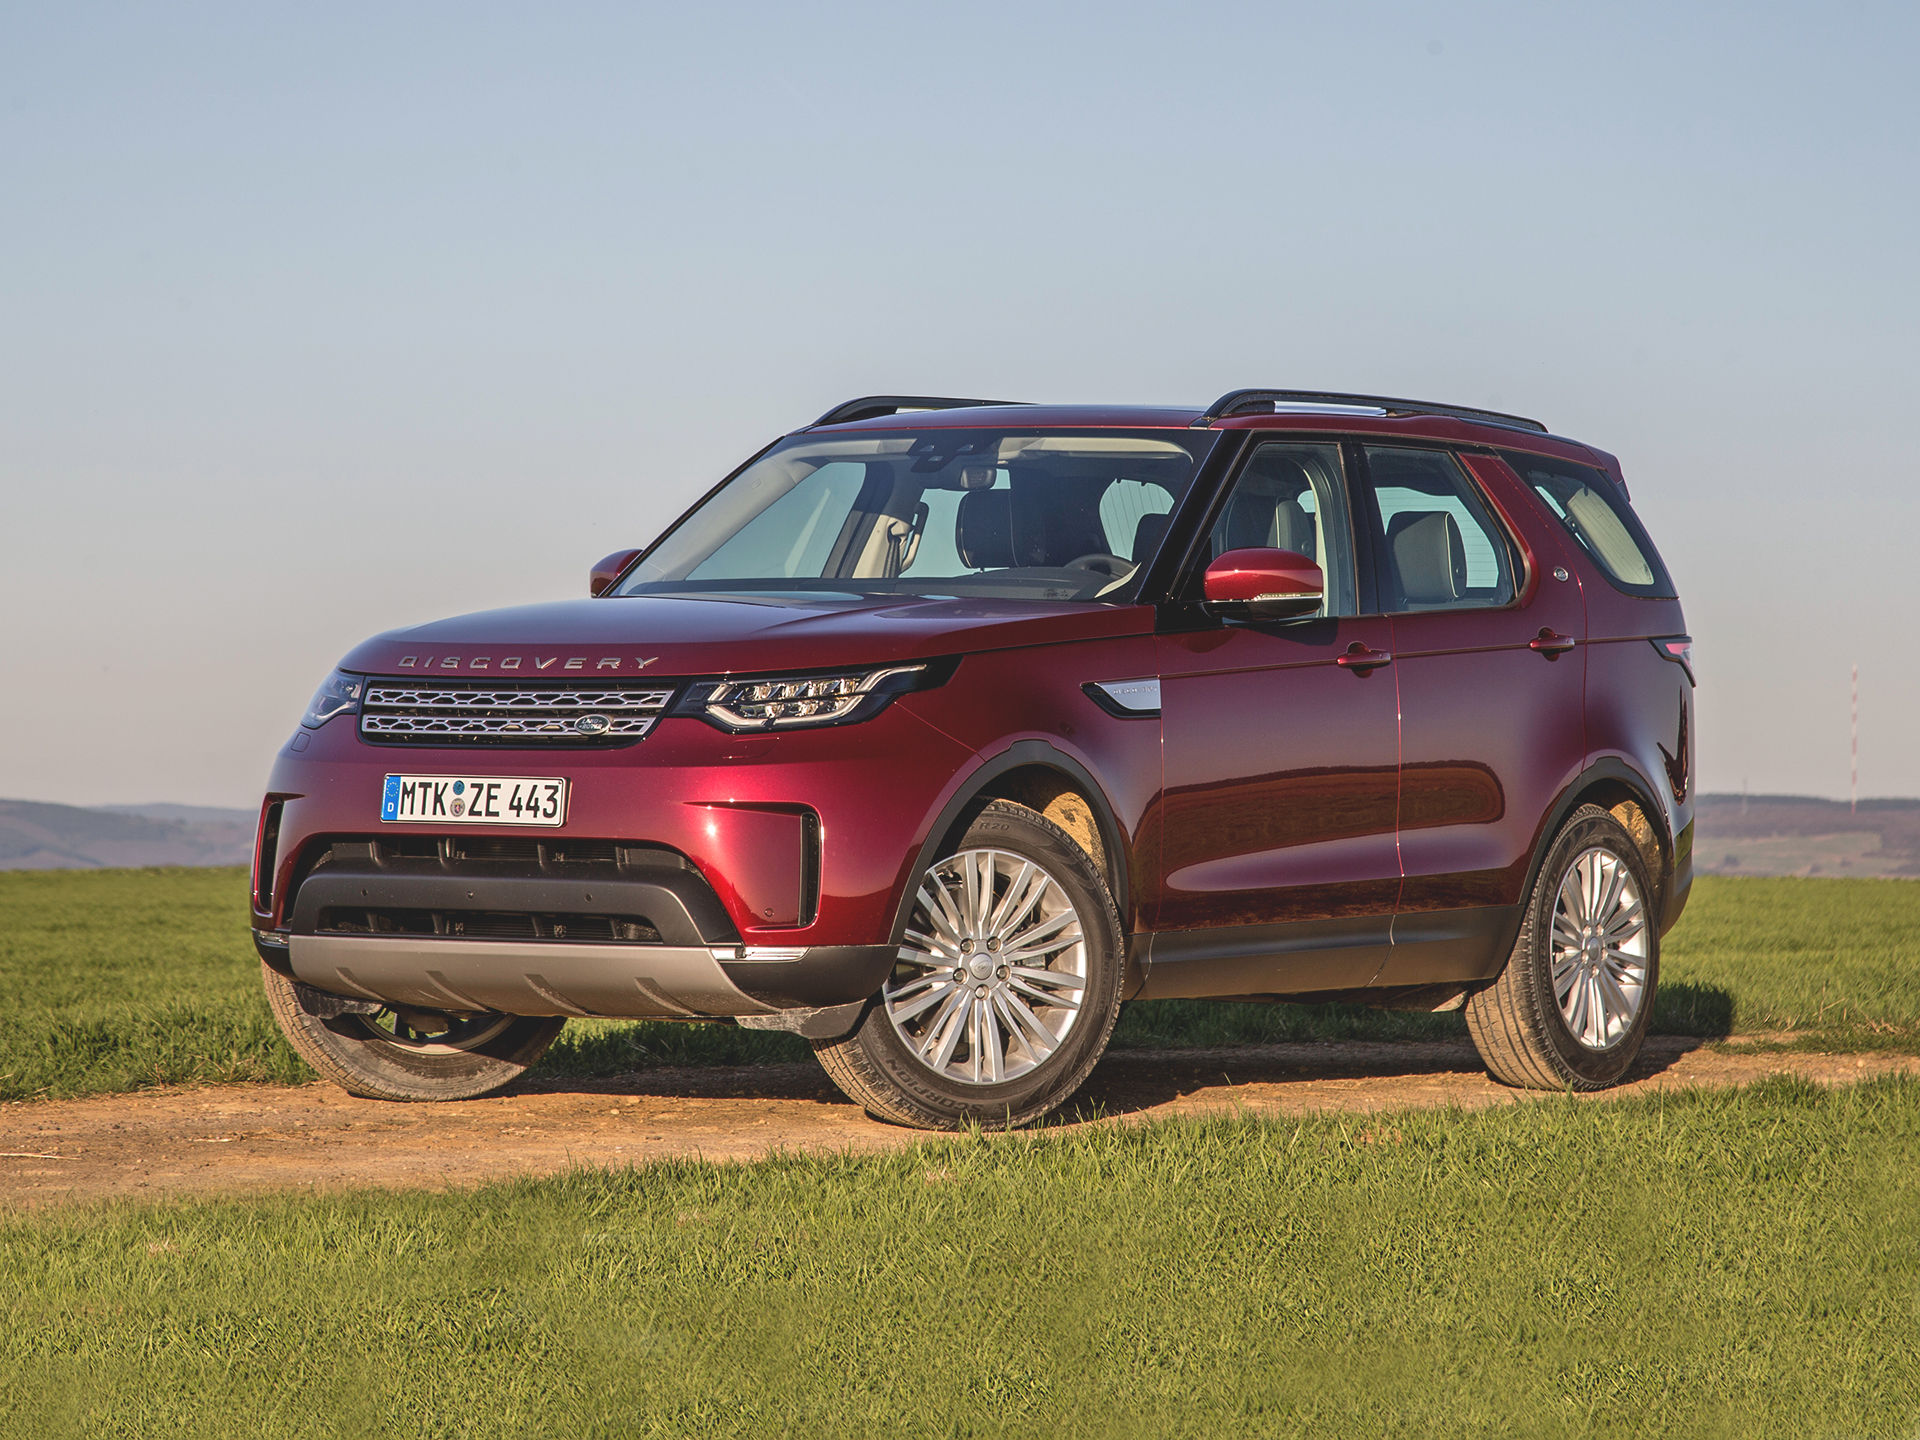 15495e279ea8 Без «понижайки» нам не надо! Land Rover останавливает продажи ...